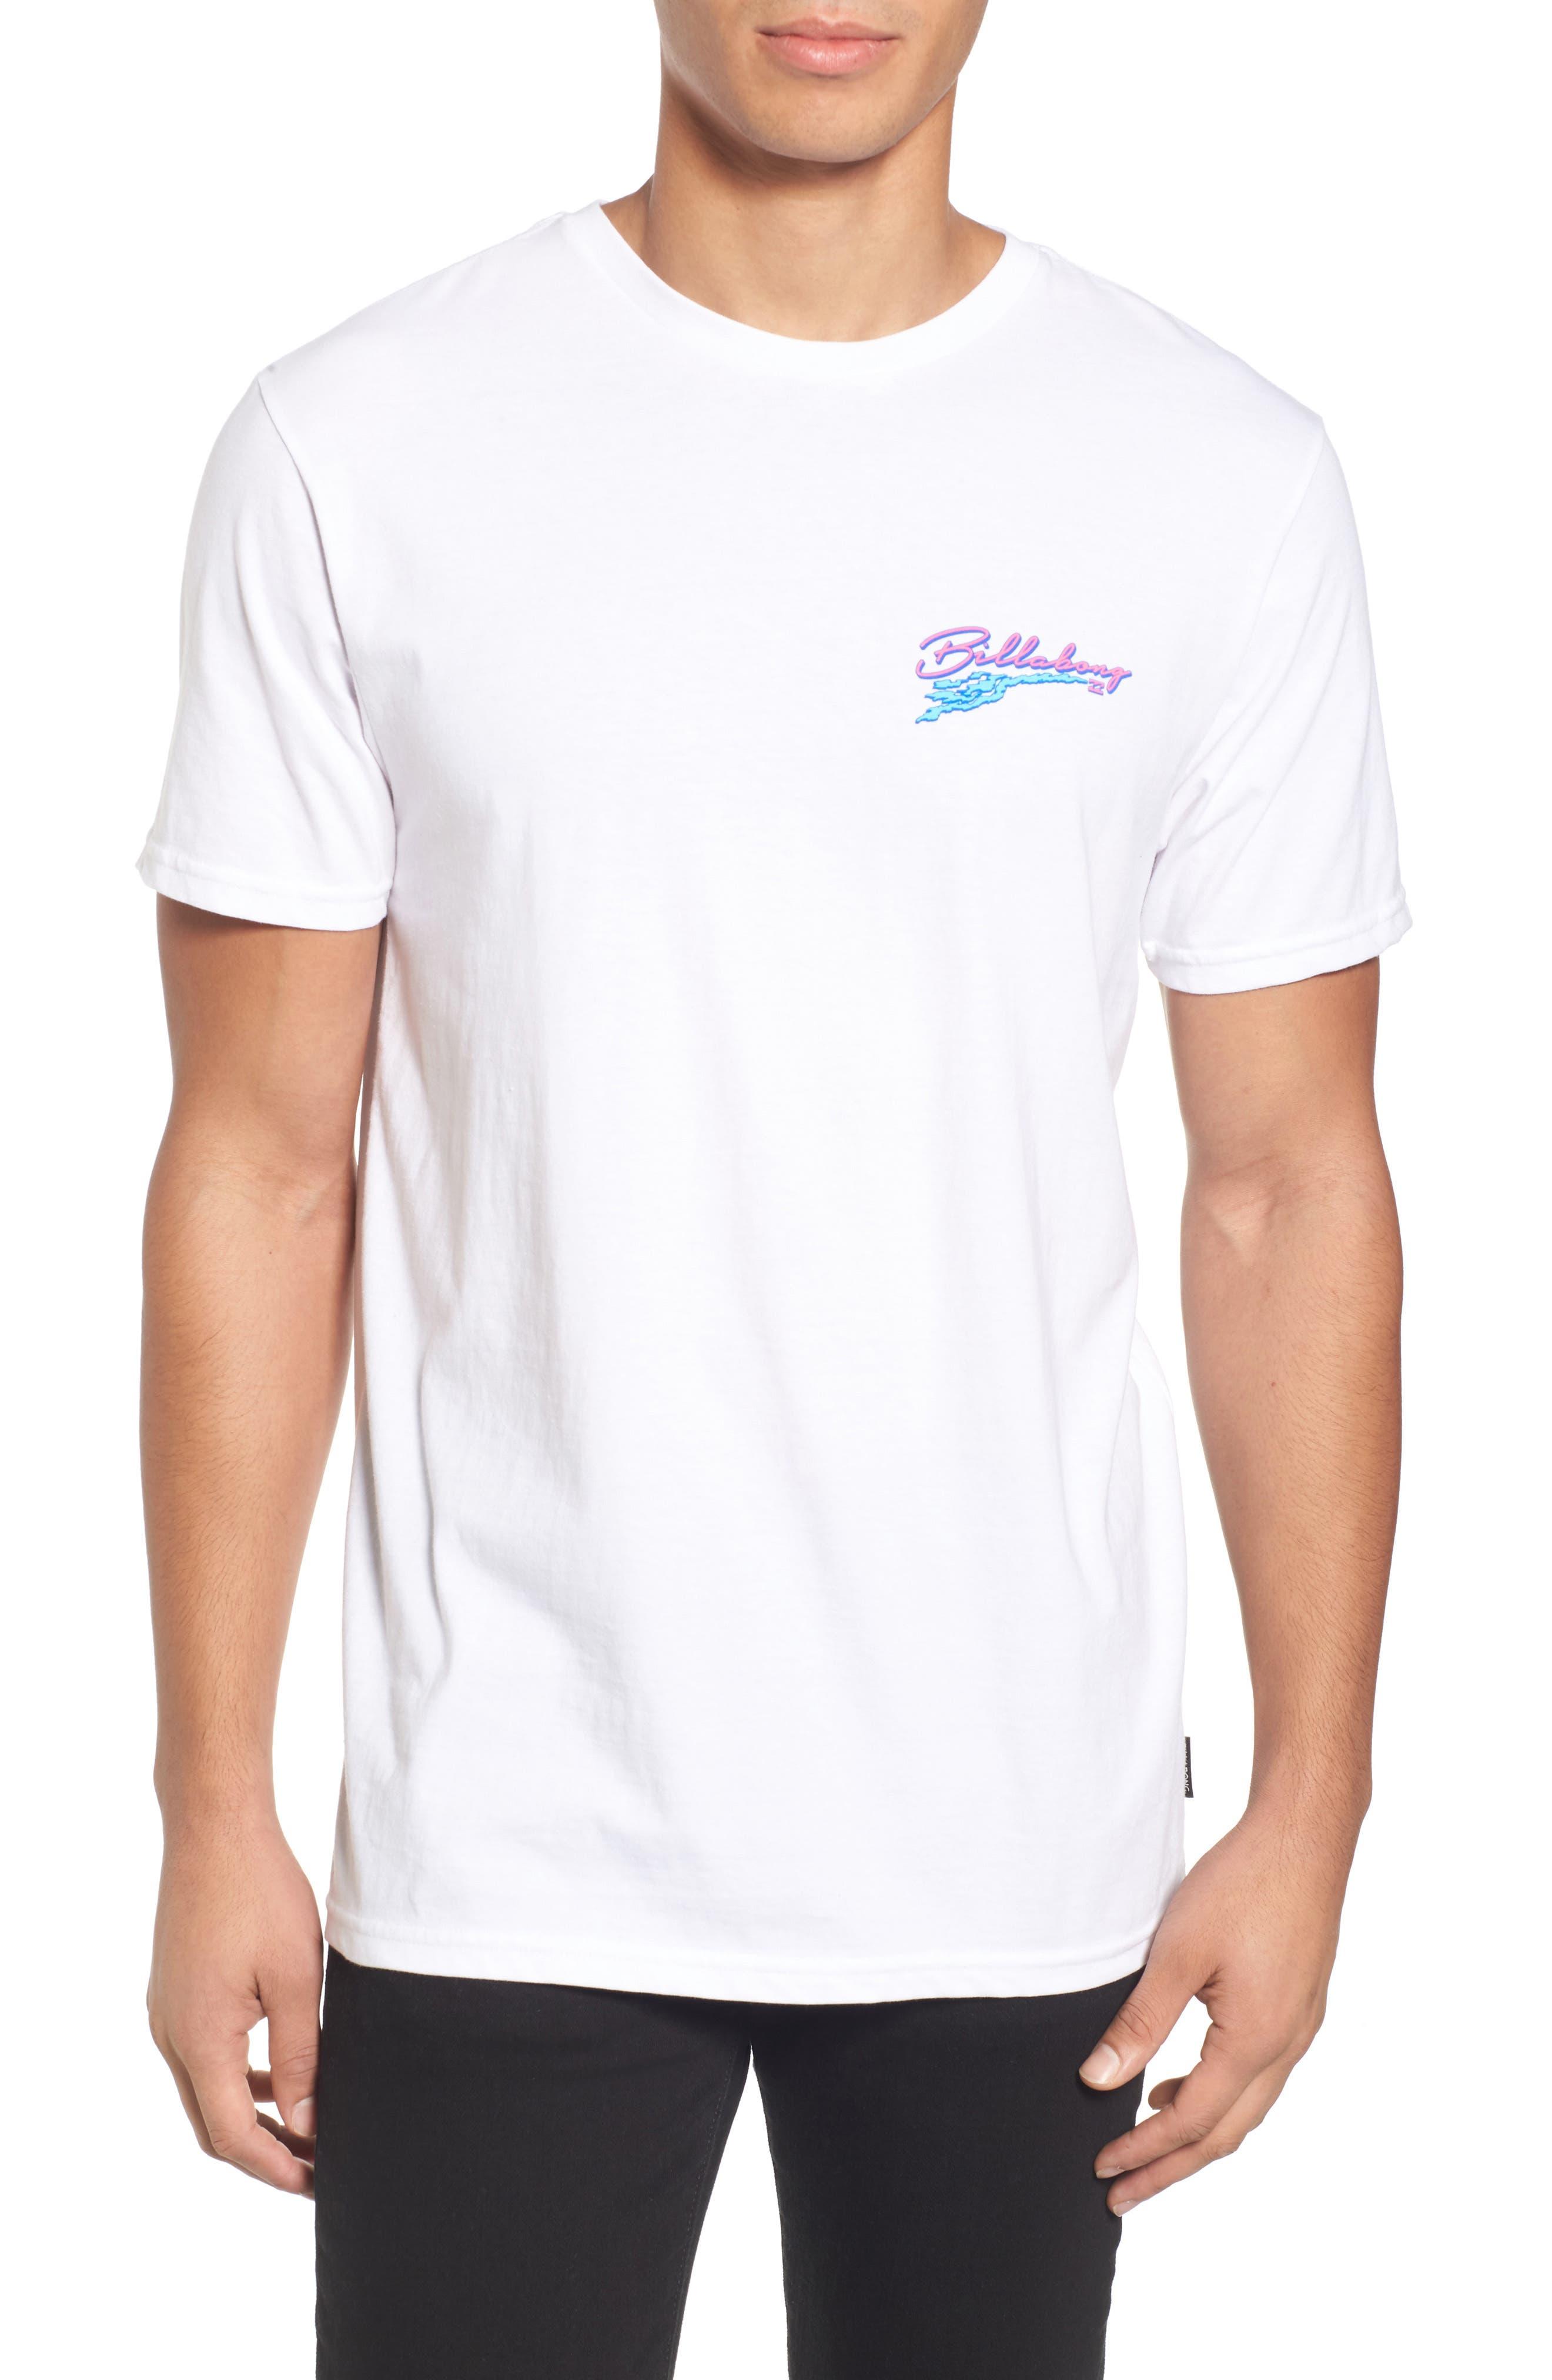 Pigdog T-Shirt,                         Main,                         color, White